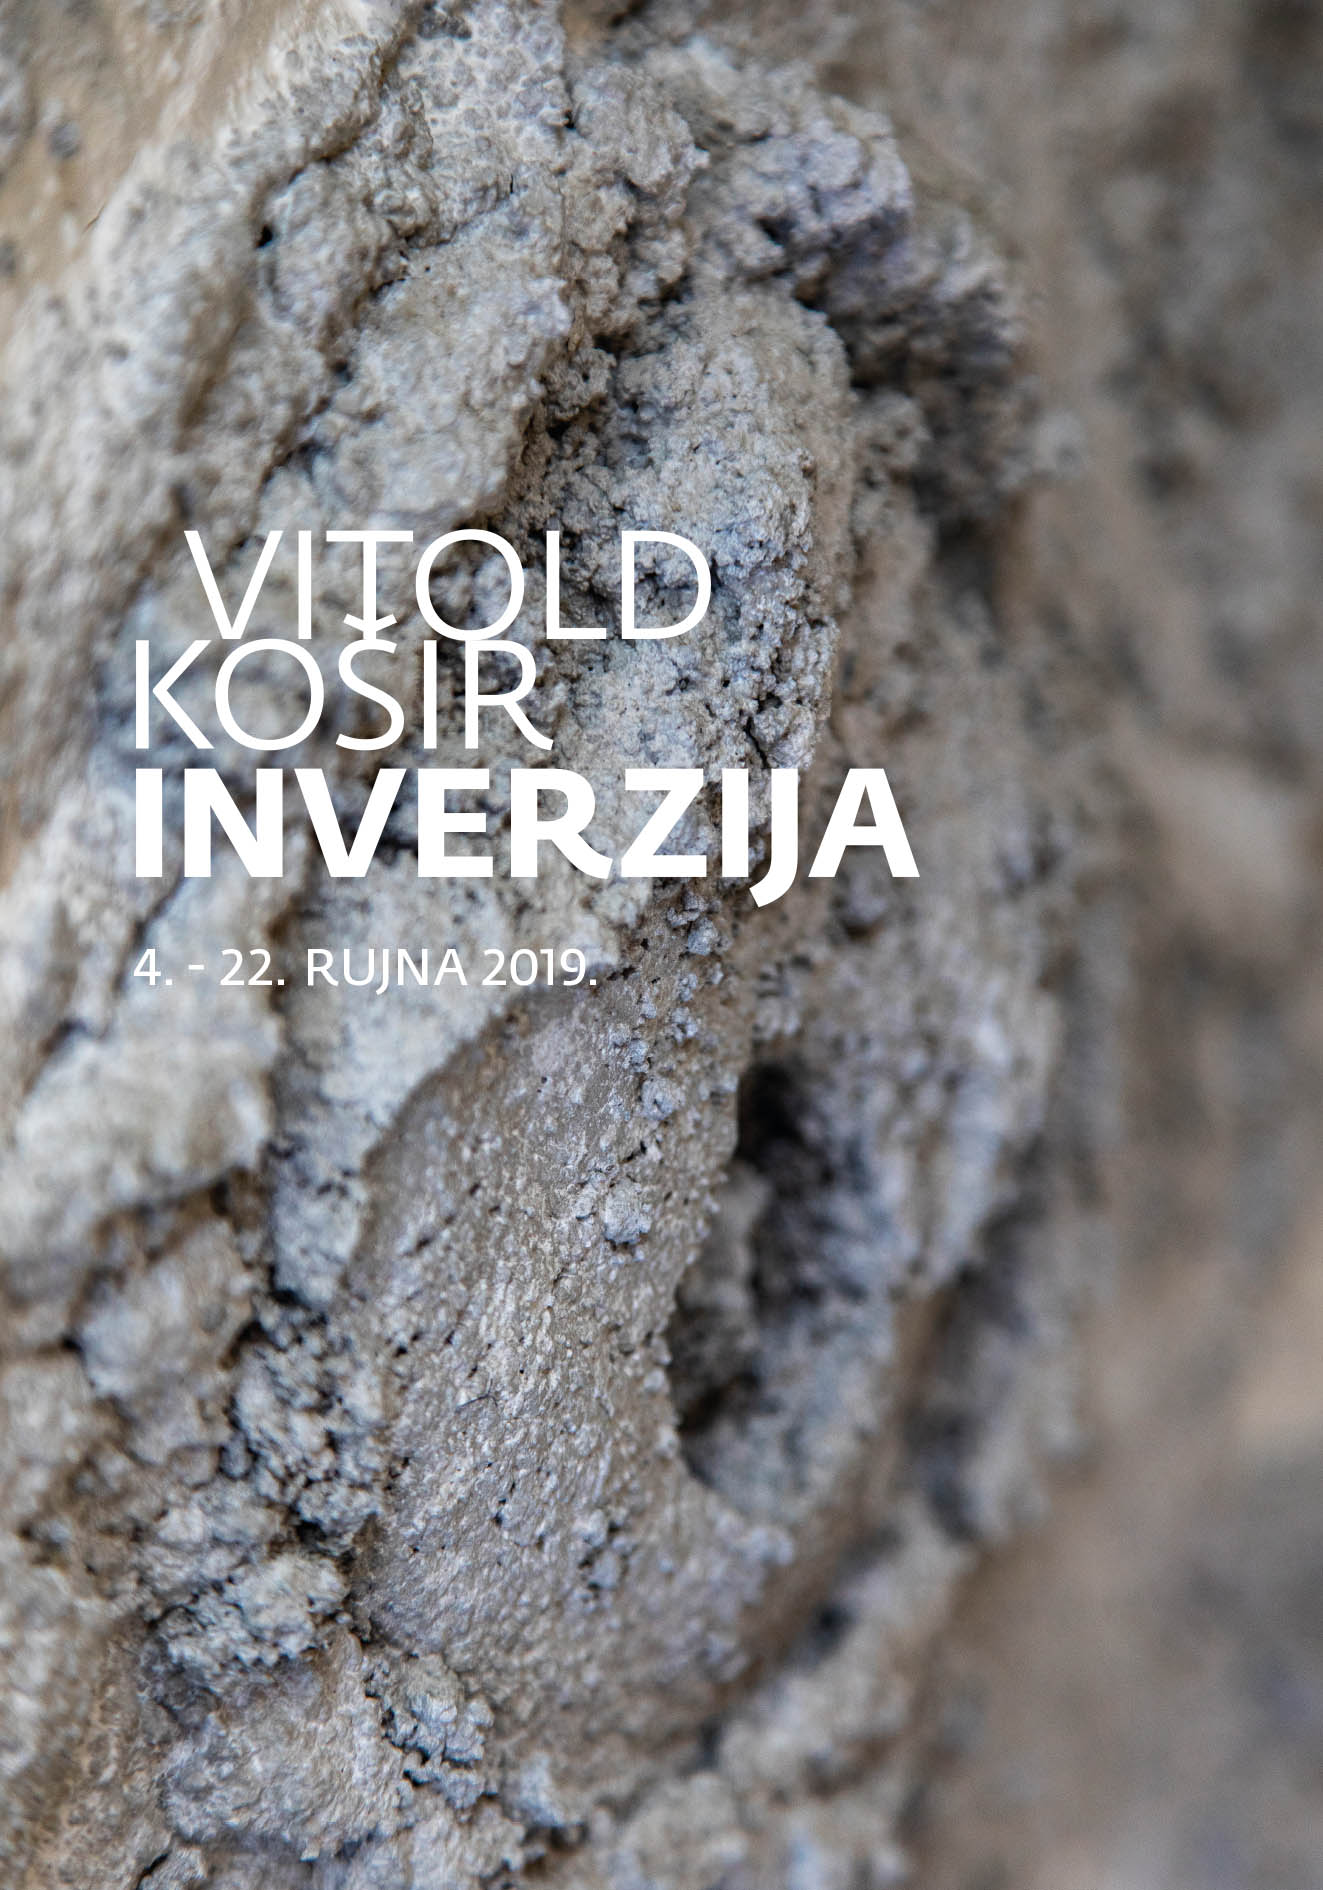 http://hrvatskifokus-2021.ga/wp-content/uploads/2019/09/INVERZIJA-plakat-B1-ZA-WEB.jpg